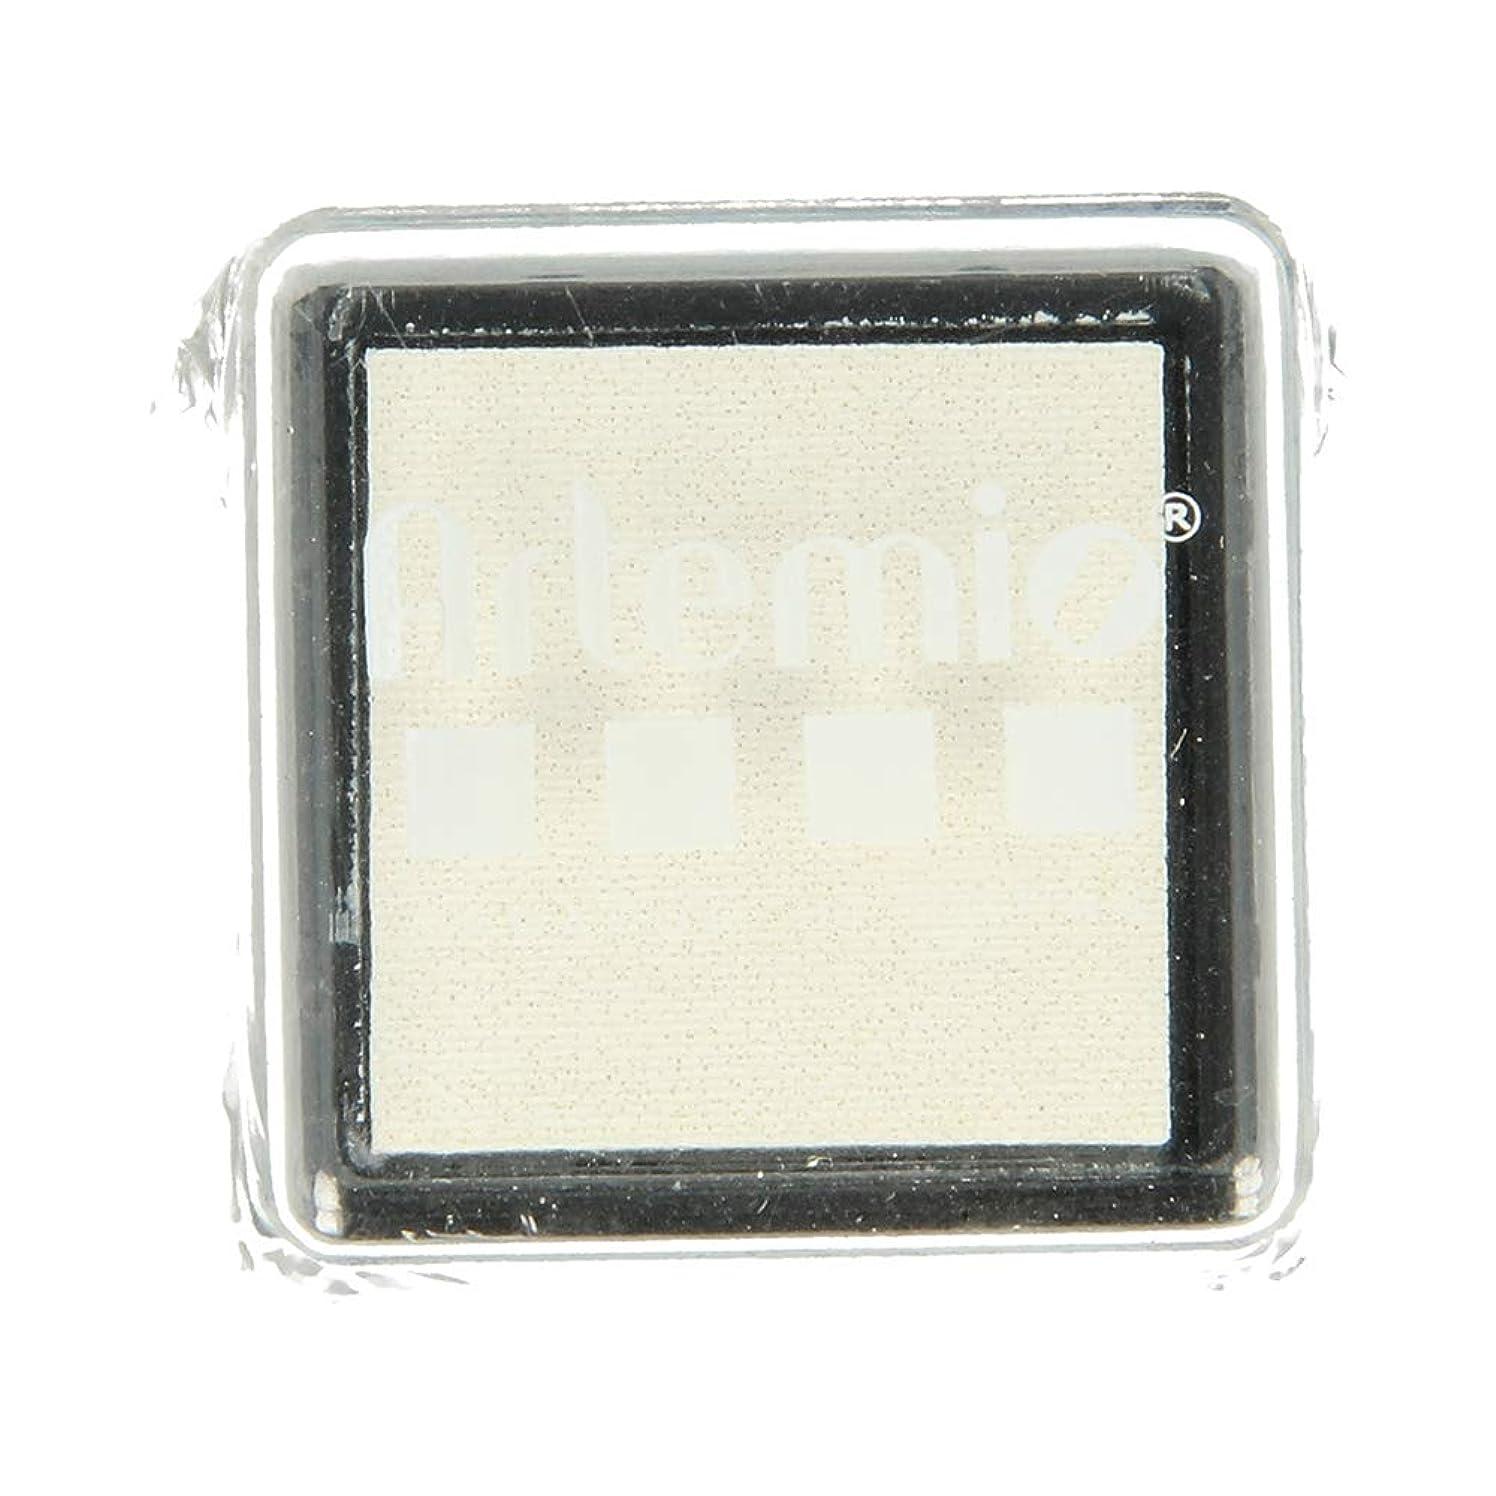 Artemio Slow Drying, Black Ink, White, 2?x 3?x 3?cm